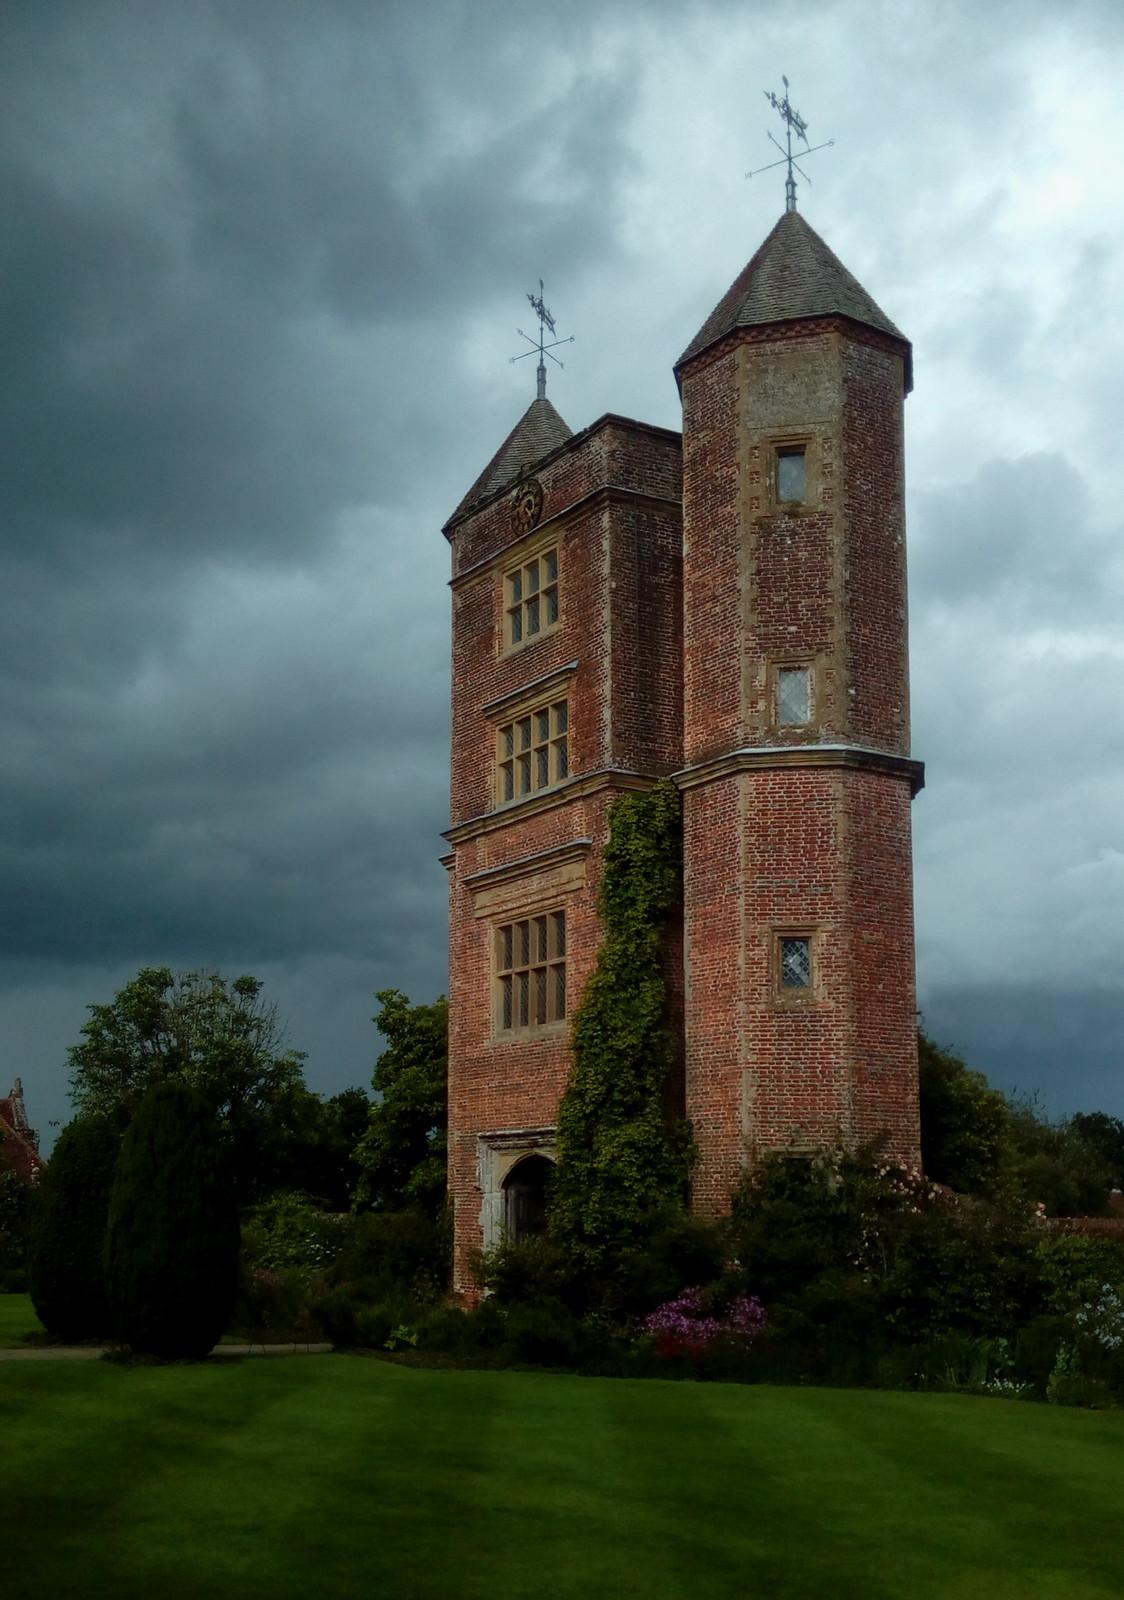 Elizabethan Tower